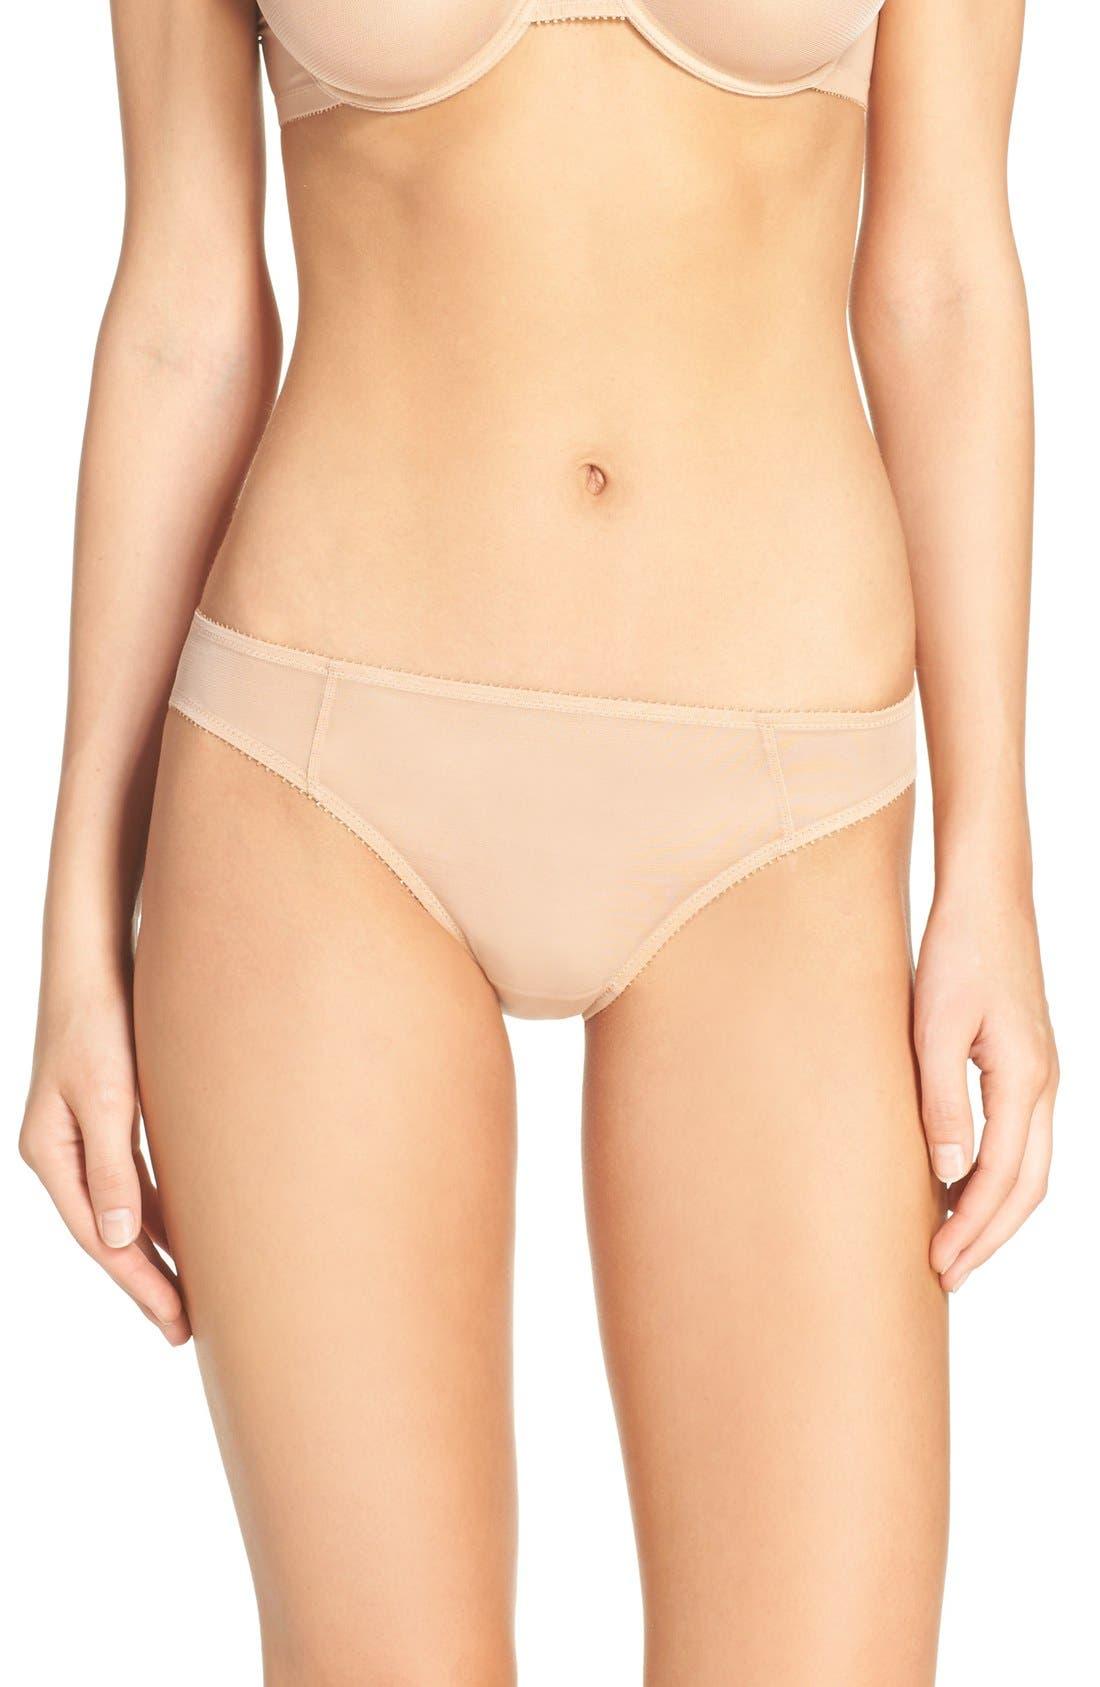 Alternate Image 1 Selected - Epure by Lise Charmel Revelation Beaute Bikini